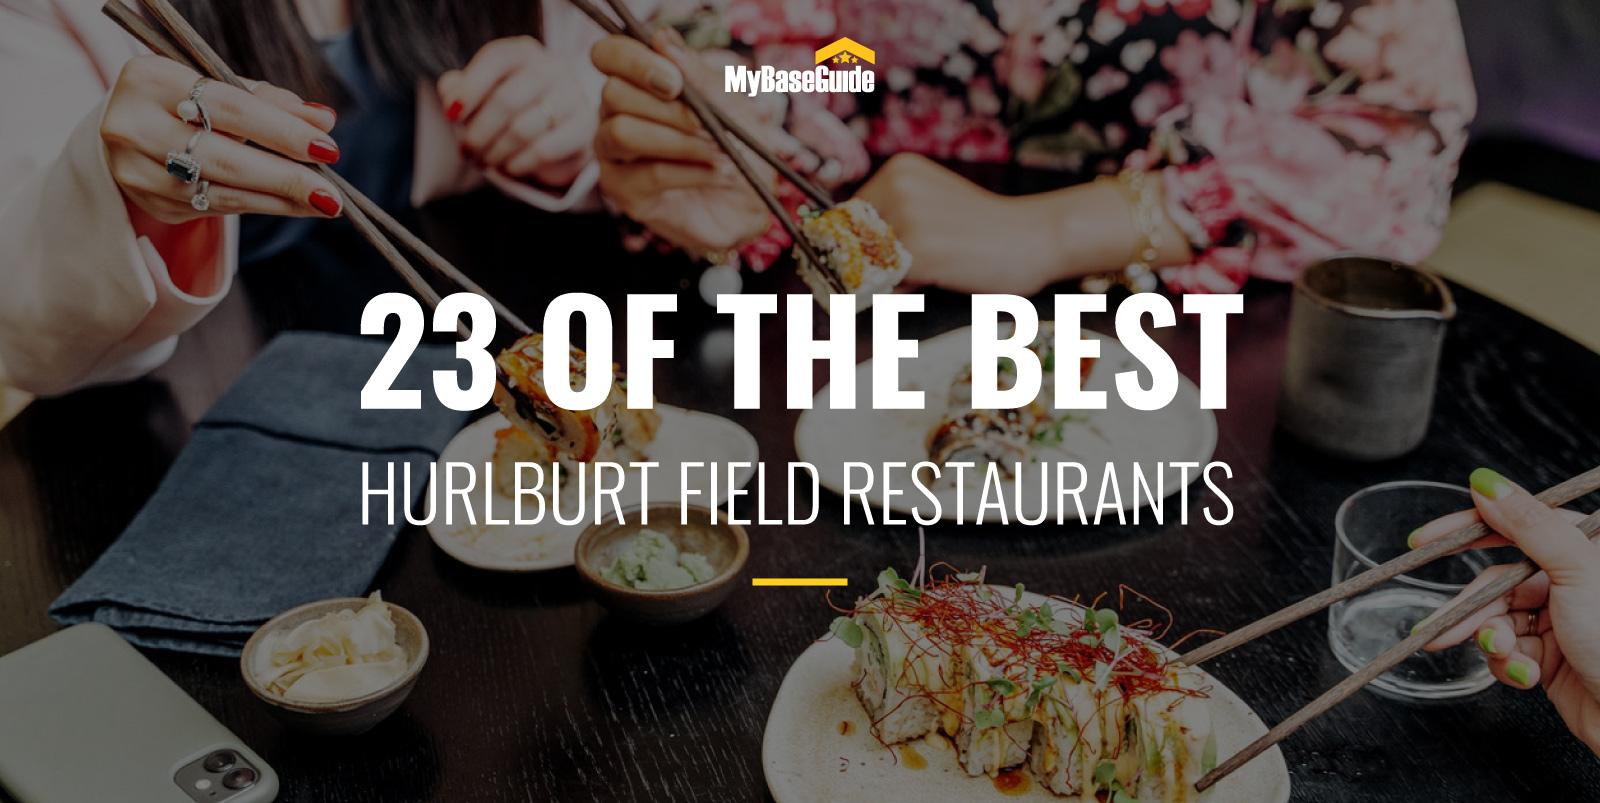 23 of the Best Hurlburt Field Restaurants